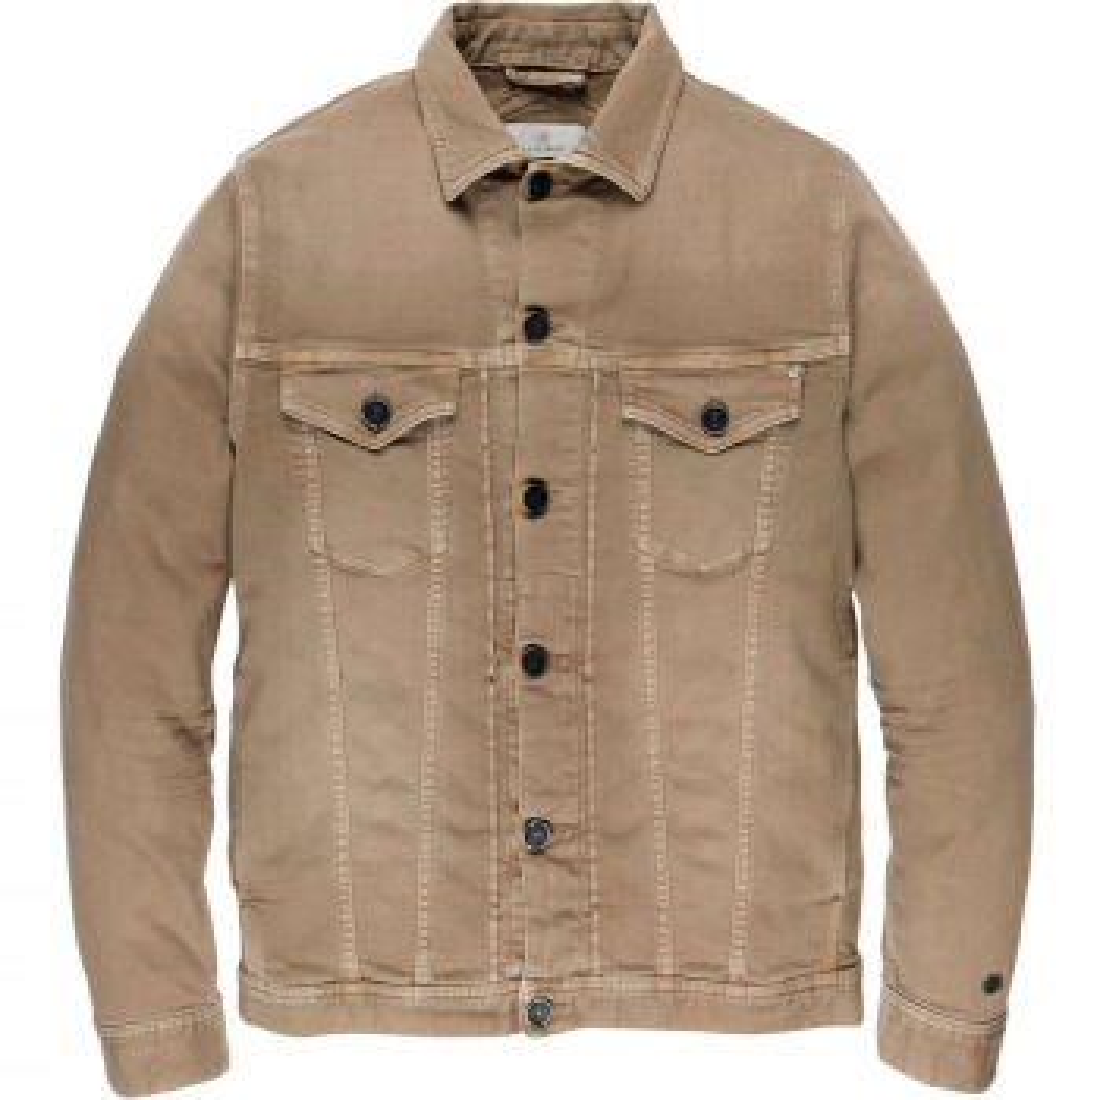 Short jacket colored denim sepia tint